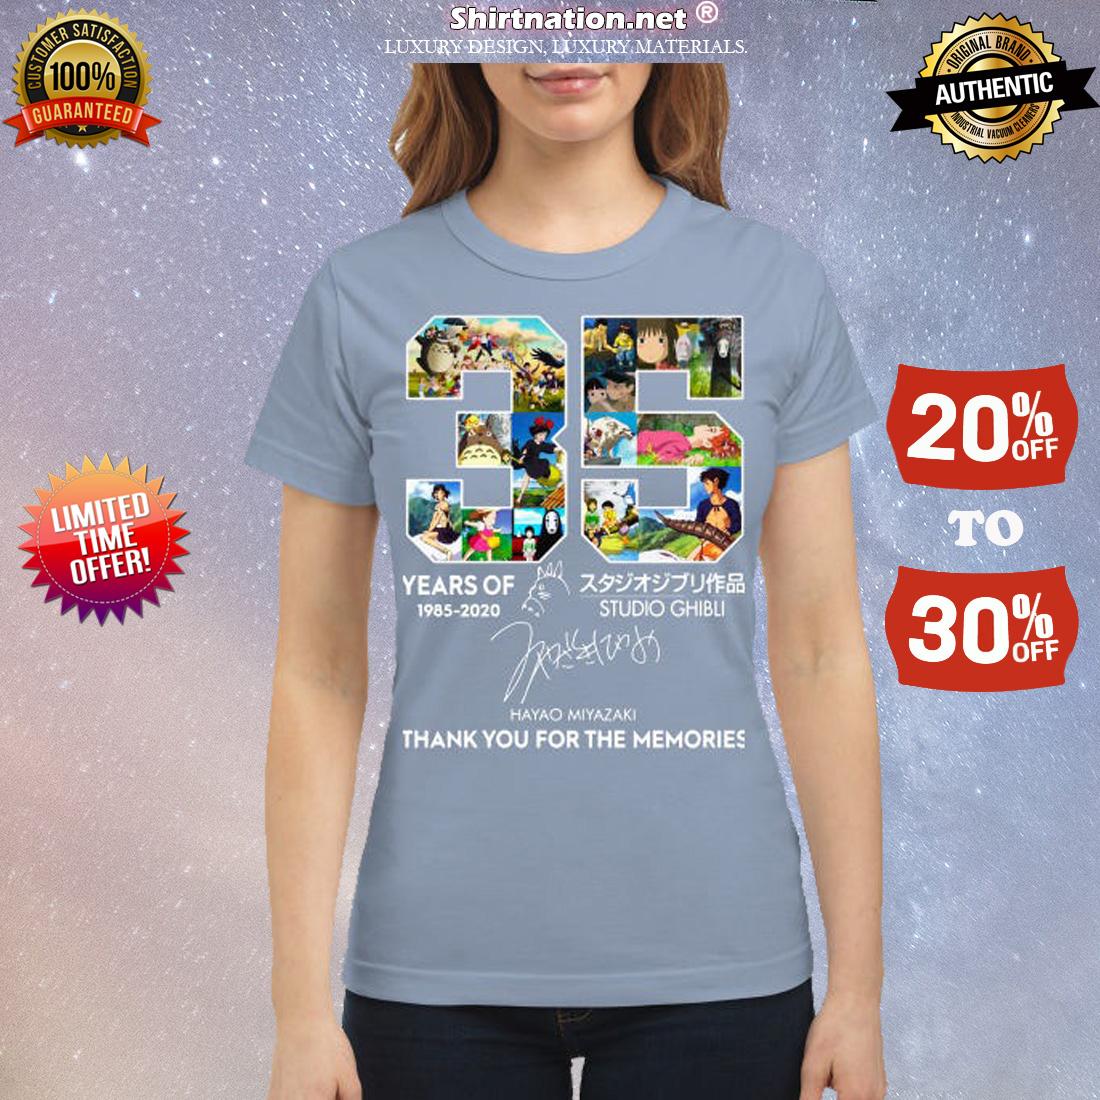 35 year of Studio Ghibli thank you for memories classic shirt